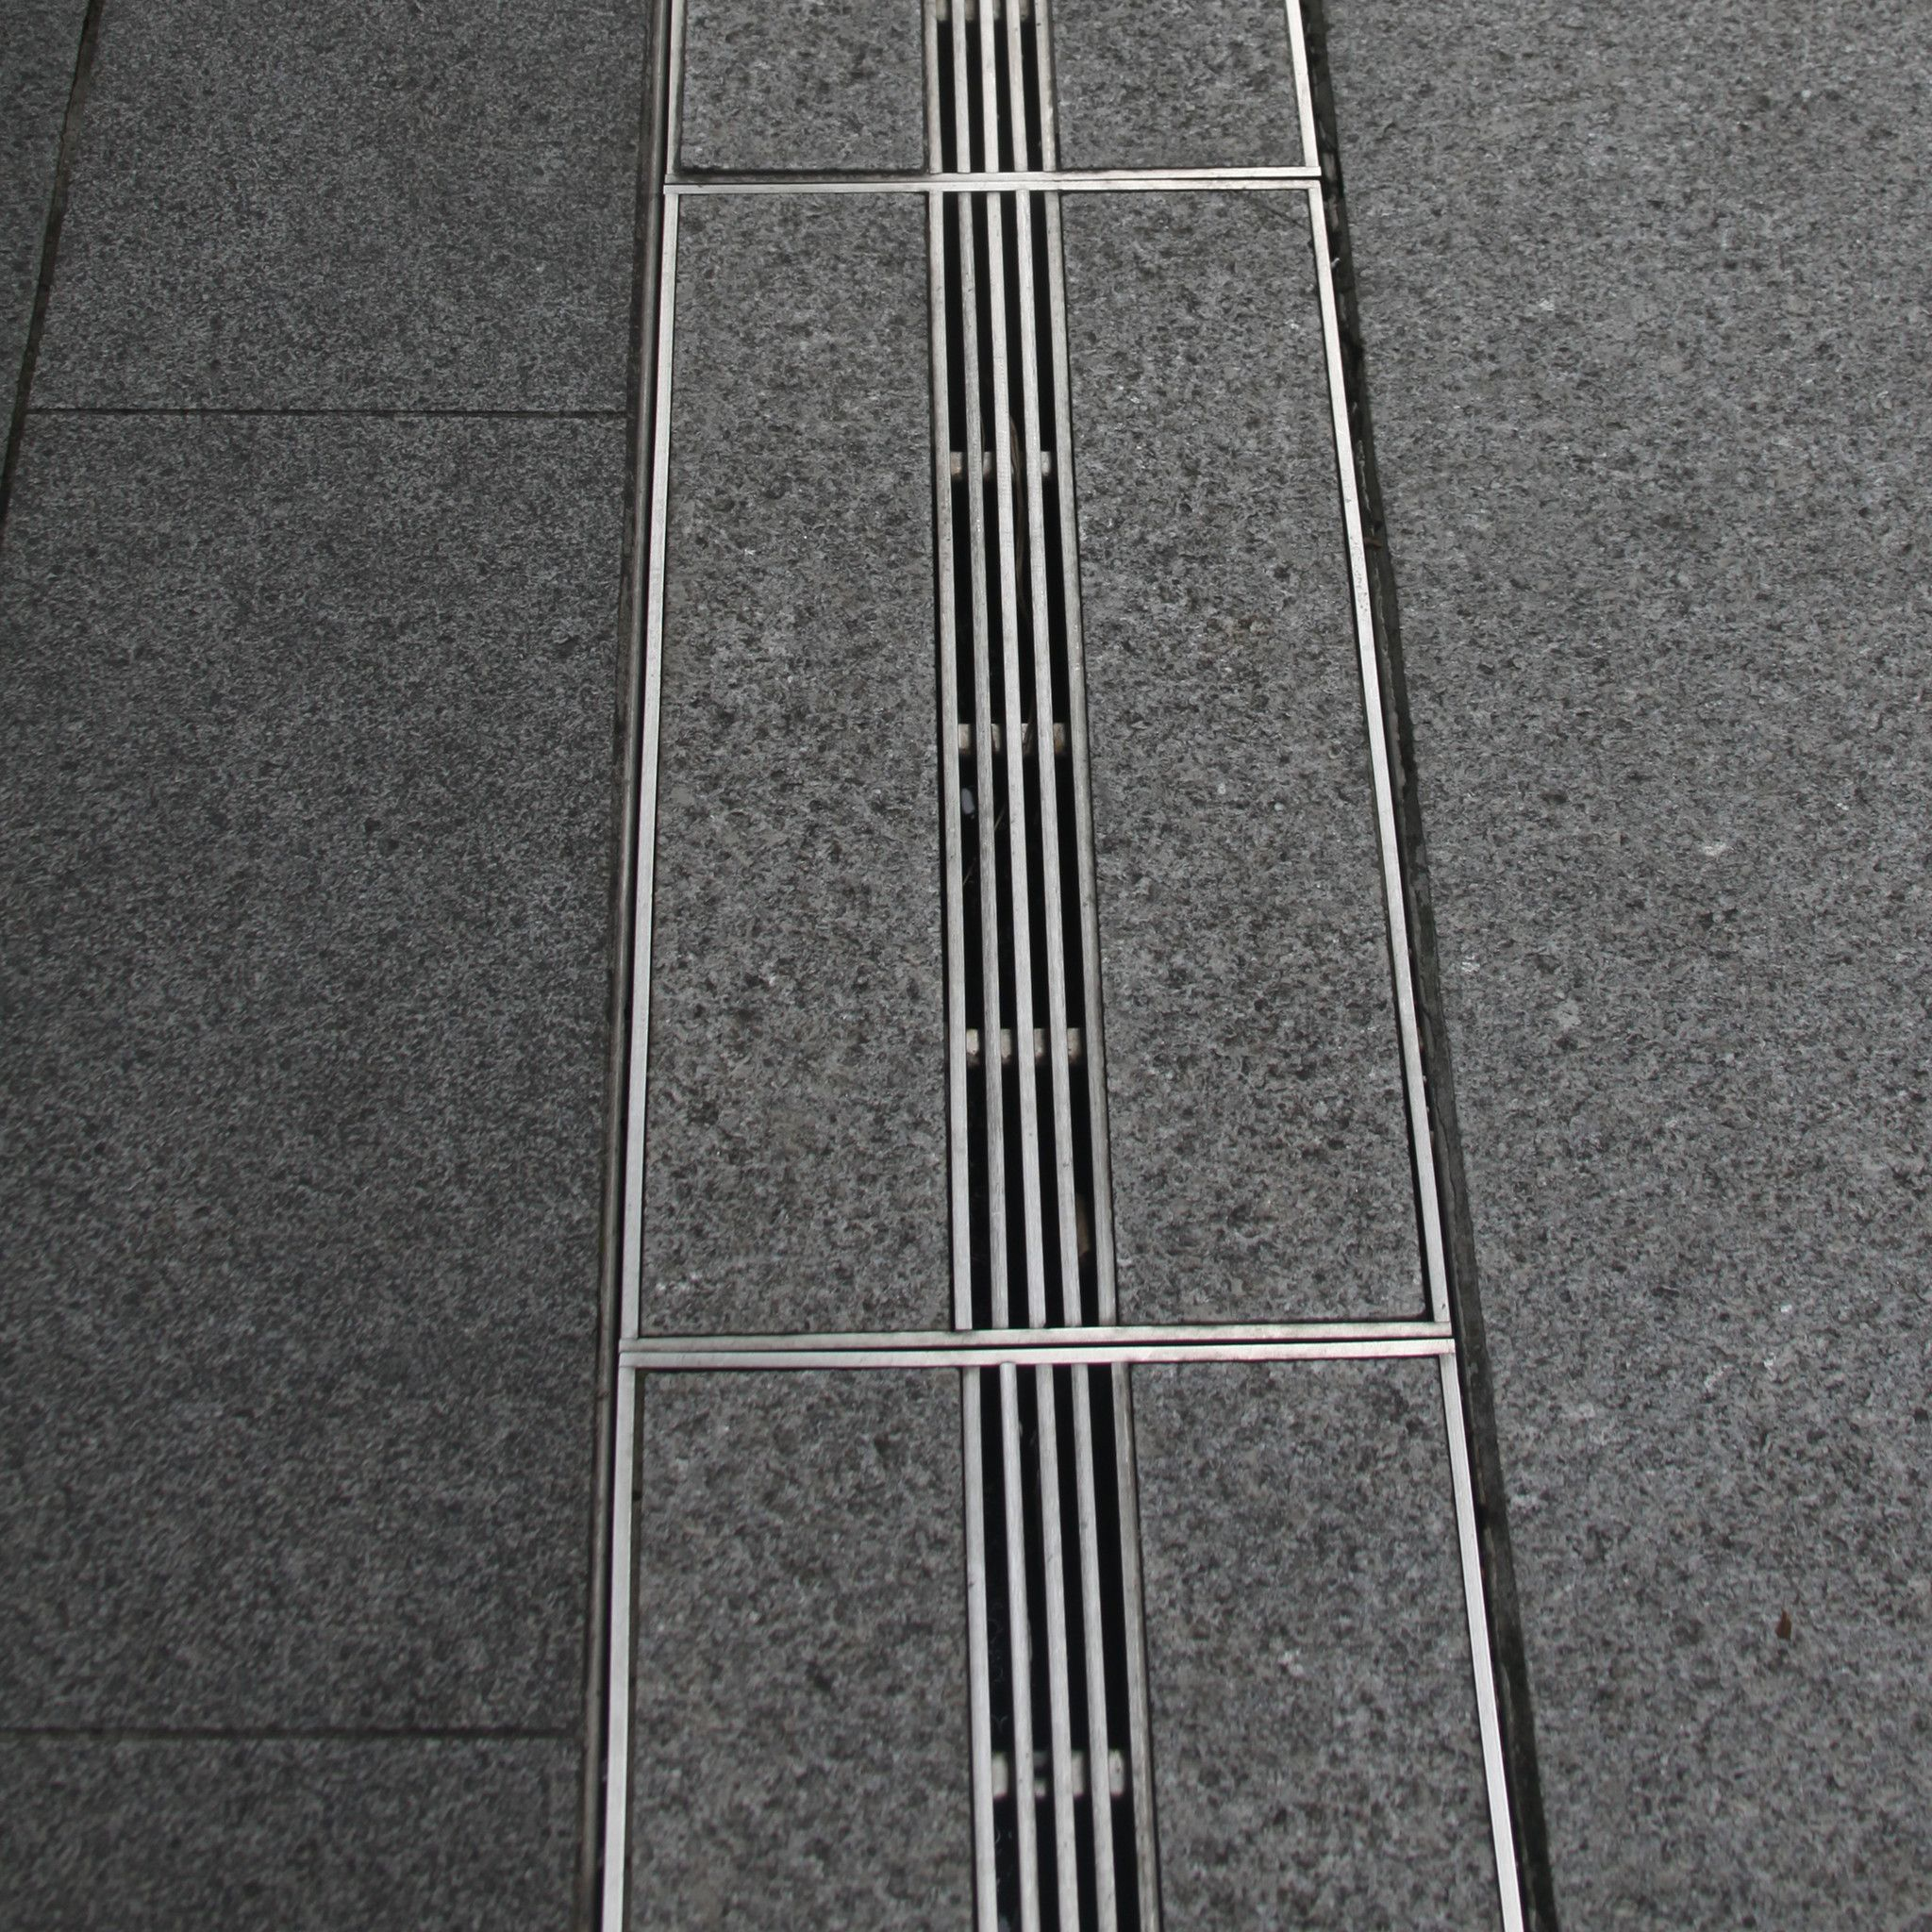 Brass bathroom linear shower drain 43 basement pinterest drain covers dailygadgetfo Choice Image